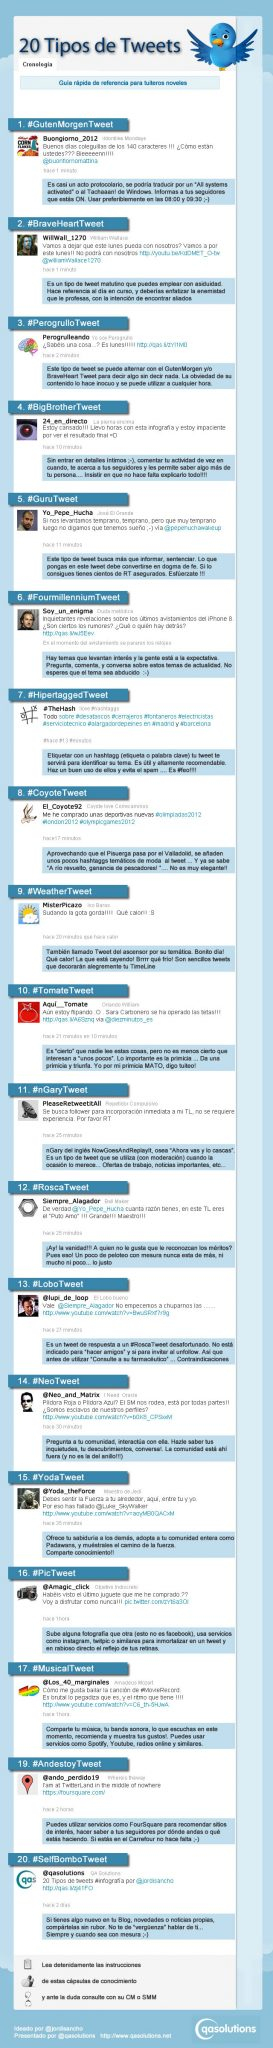 20 tipos tweets